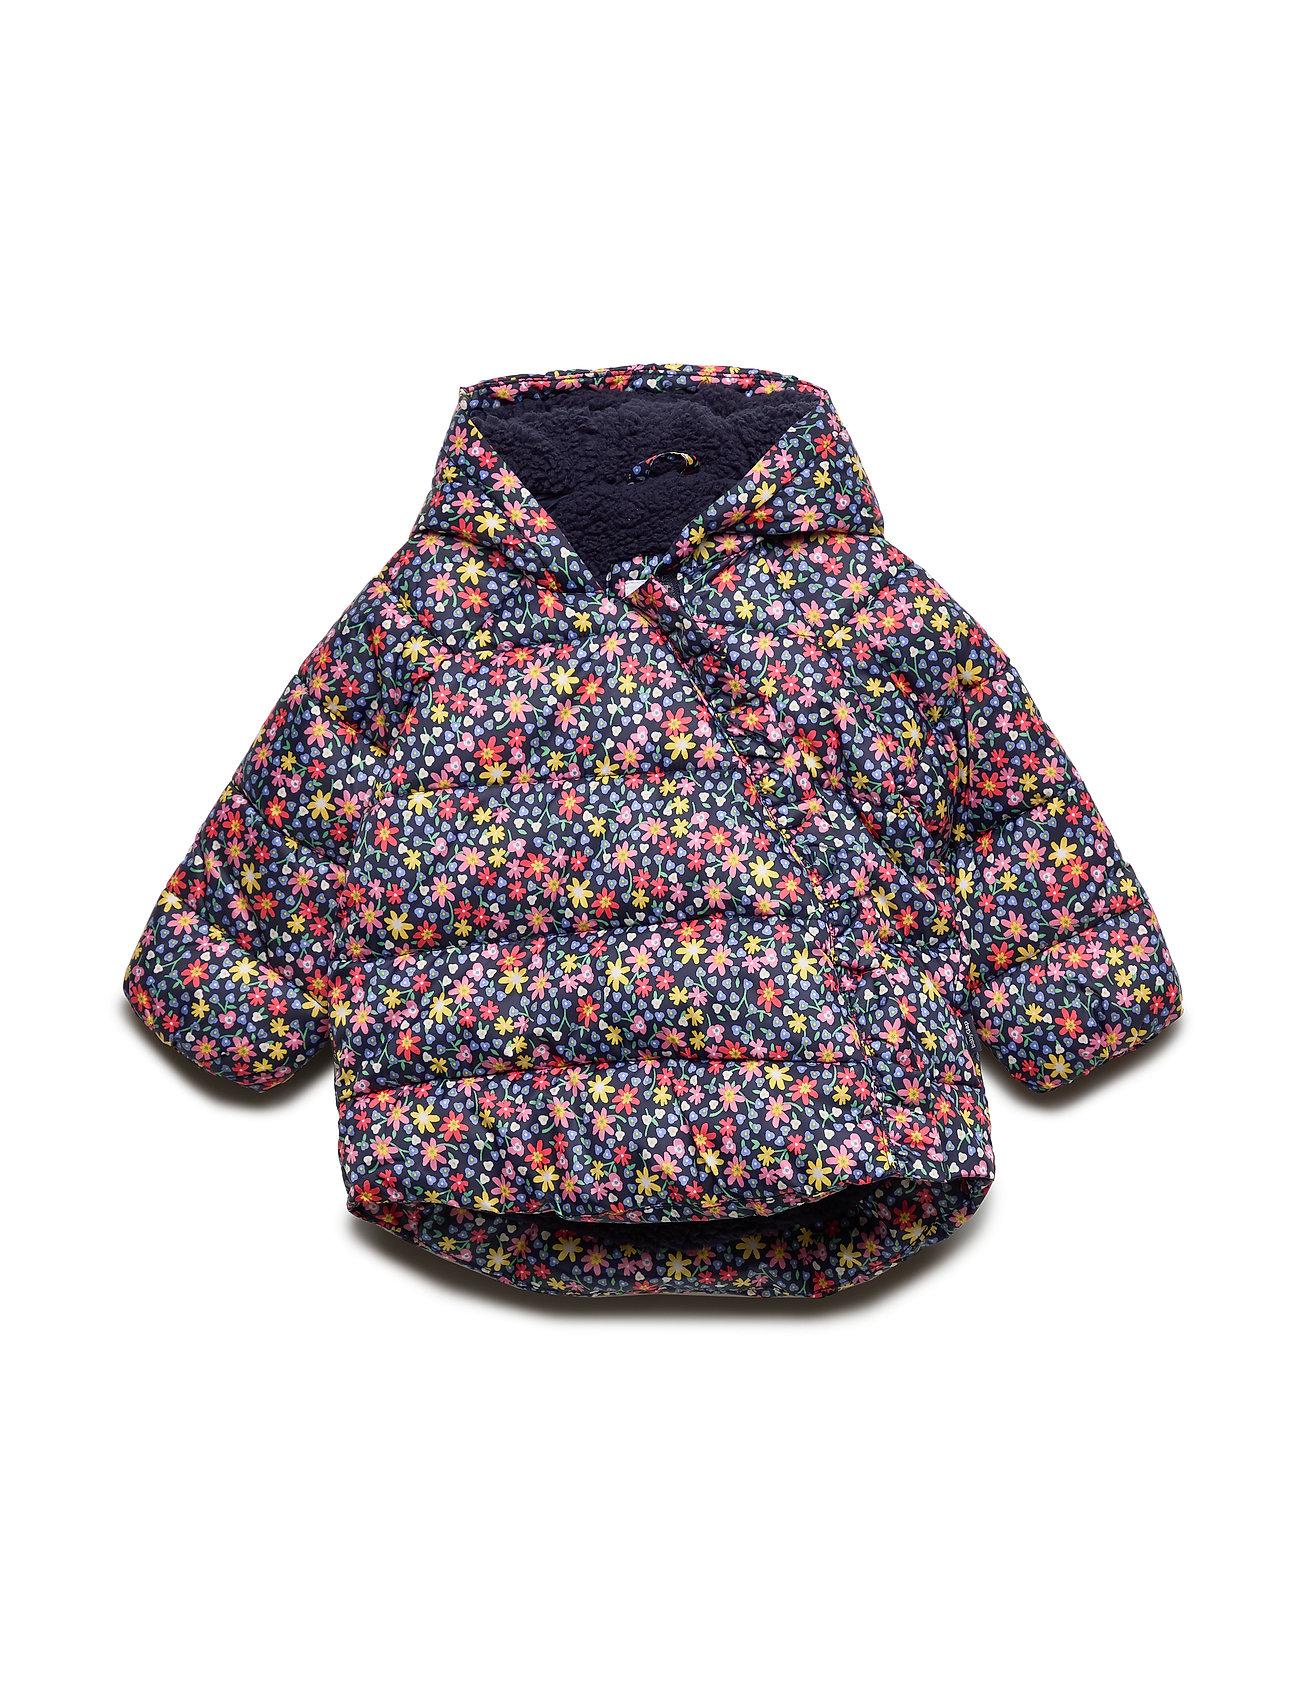 GAP Baby ColdControl Max Kimono Jacket - NAVY FLORAL